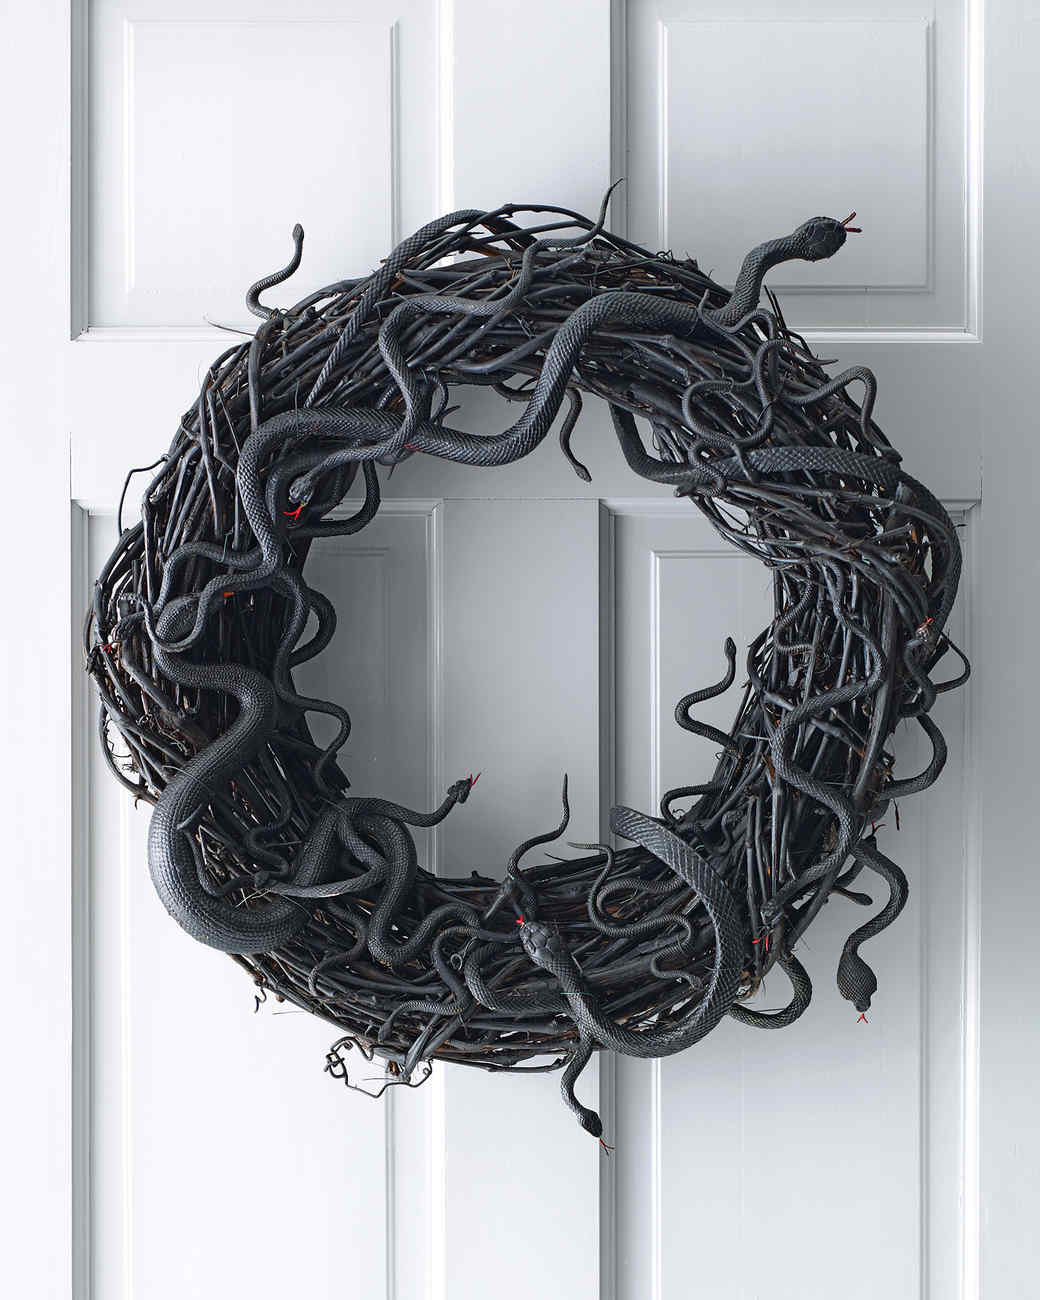 Black Snakes Halloween Wreath DIY